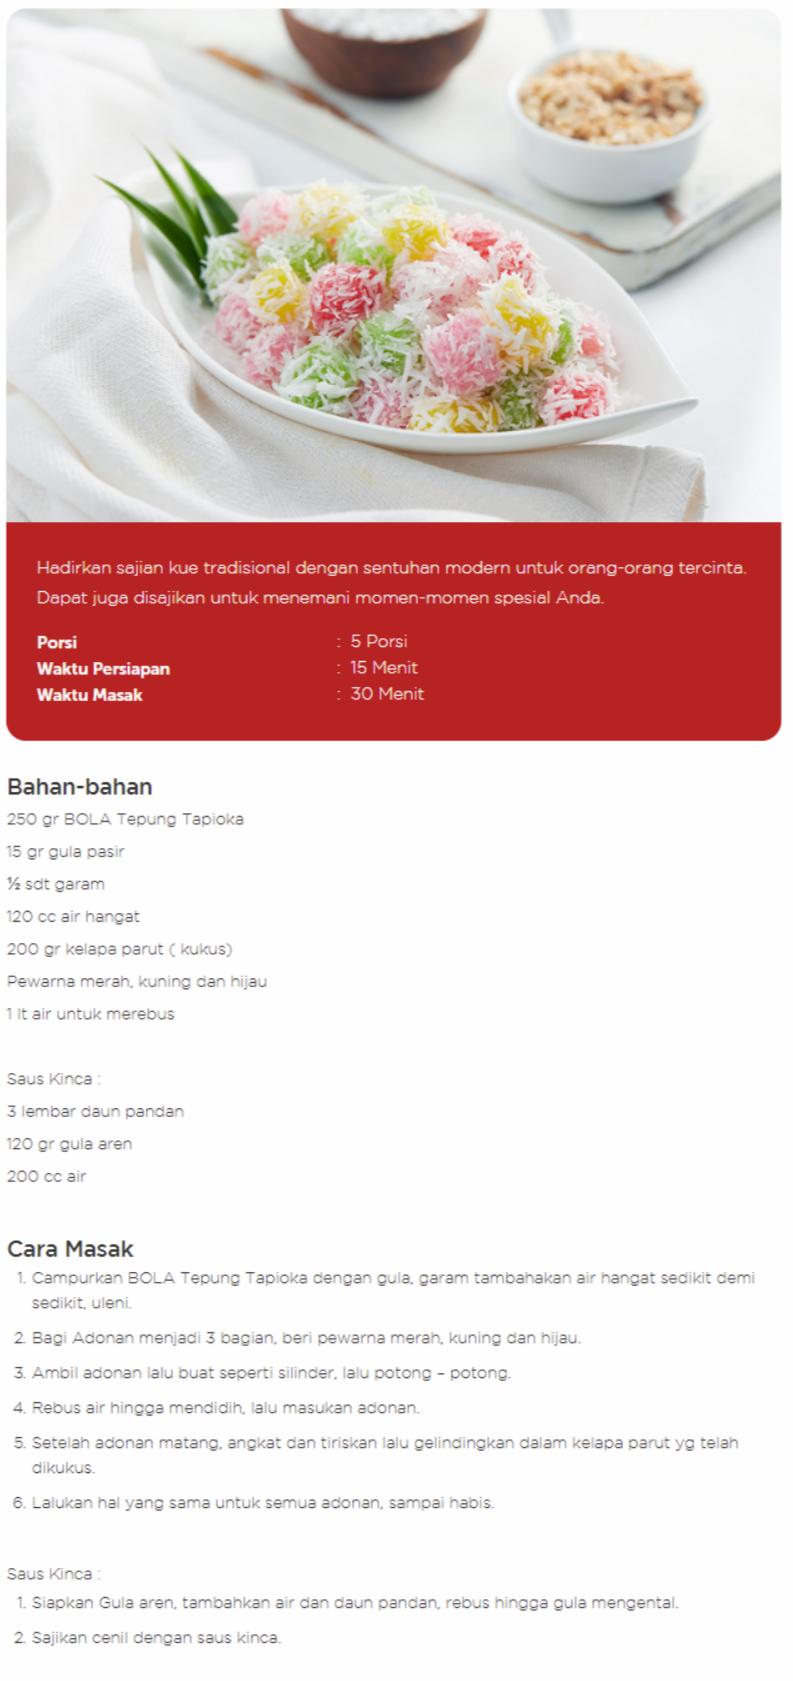 Resep Cara Membuat Kue Cenil Enak Sederhana Resep Resep Makanan Resep Makanan